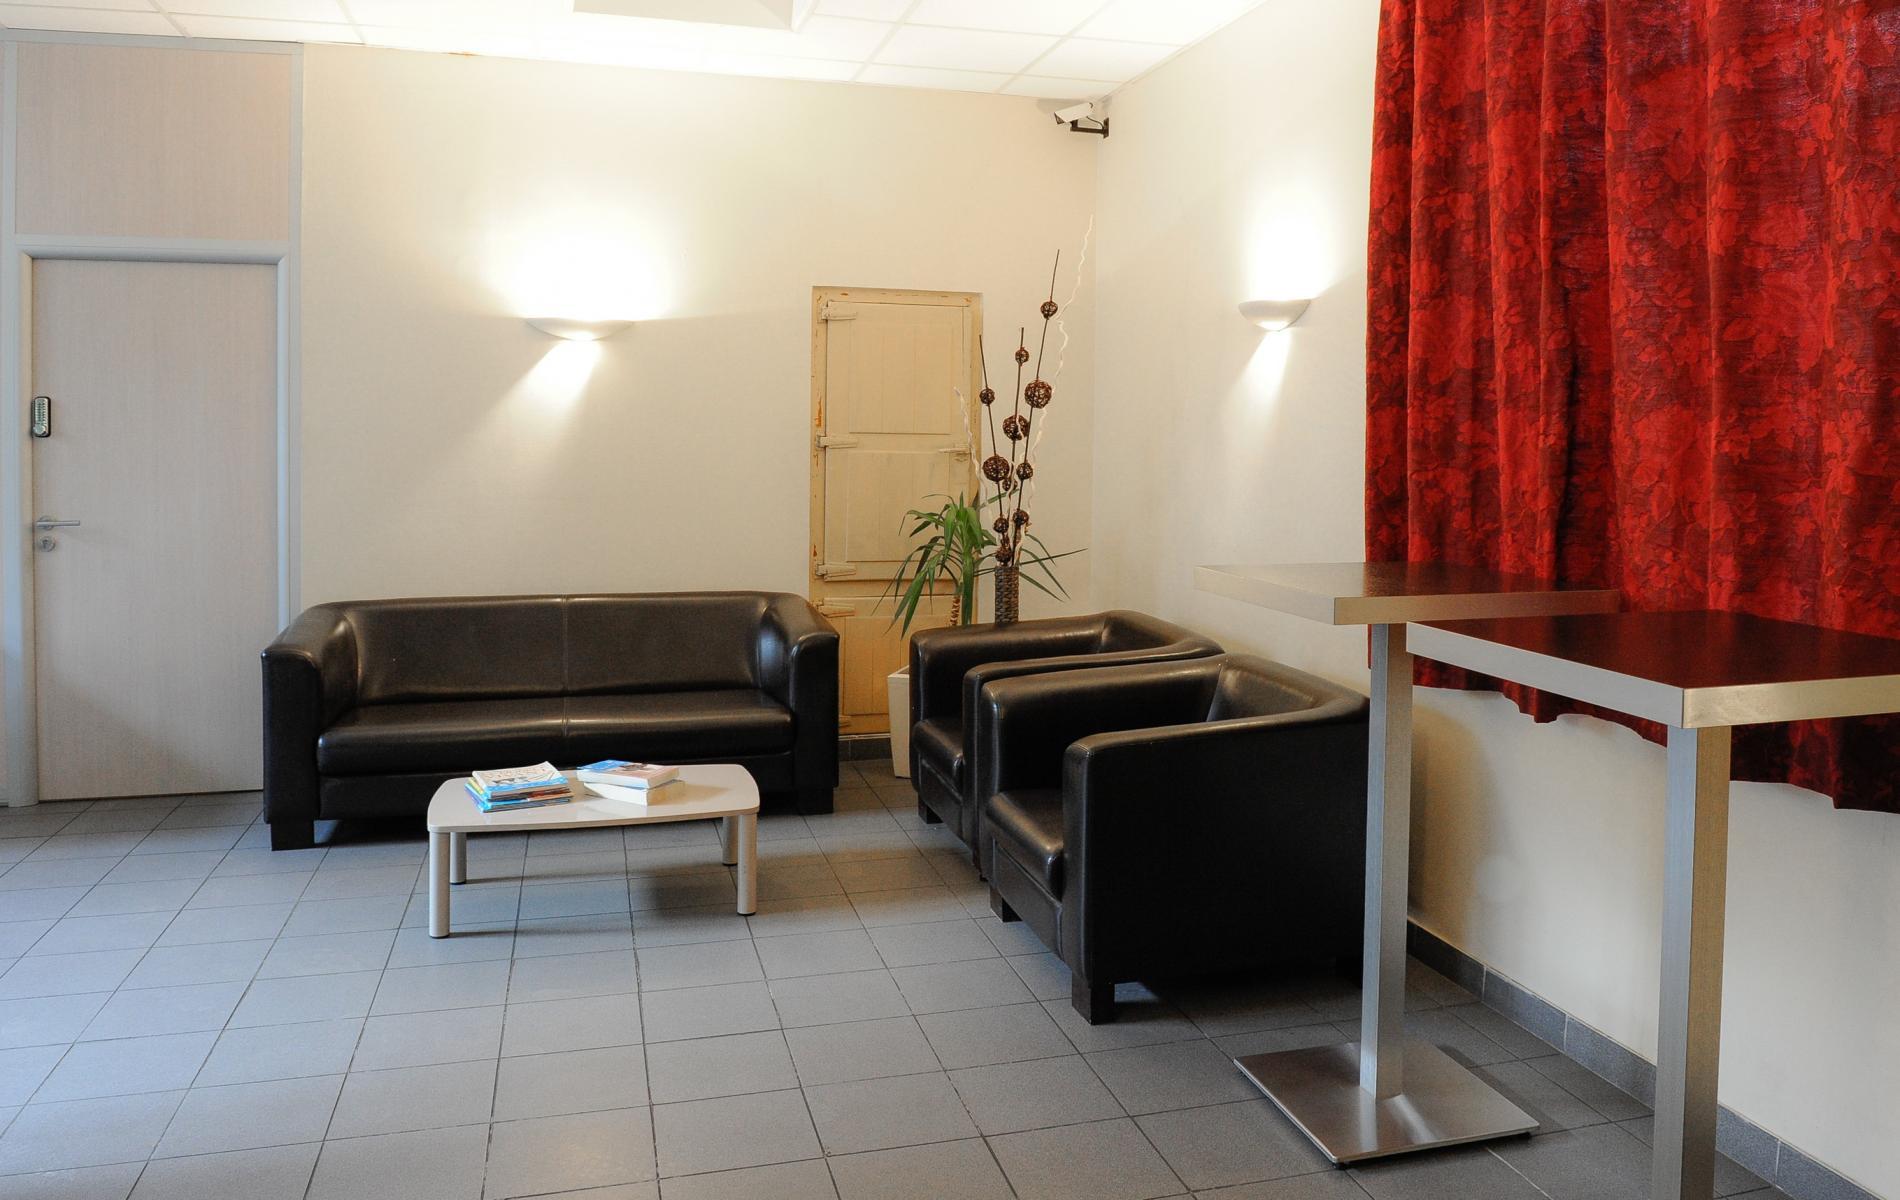 Résidence Hotelière du Havre - Hotel en Normandie